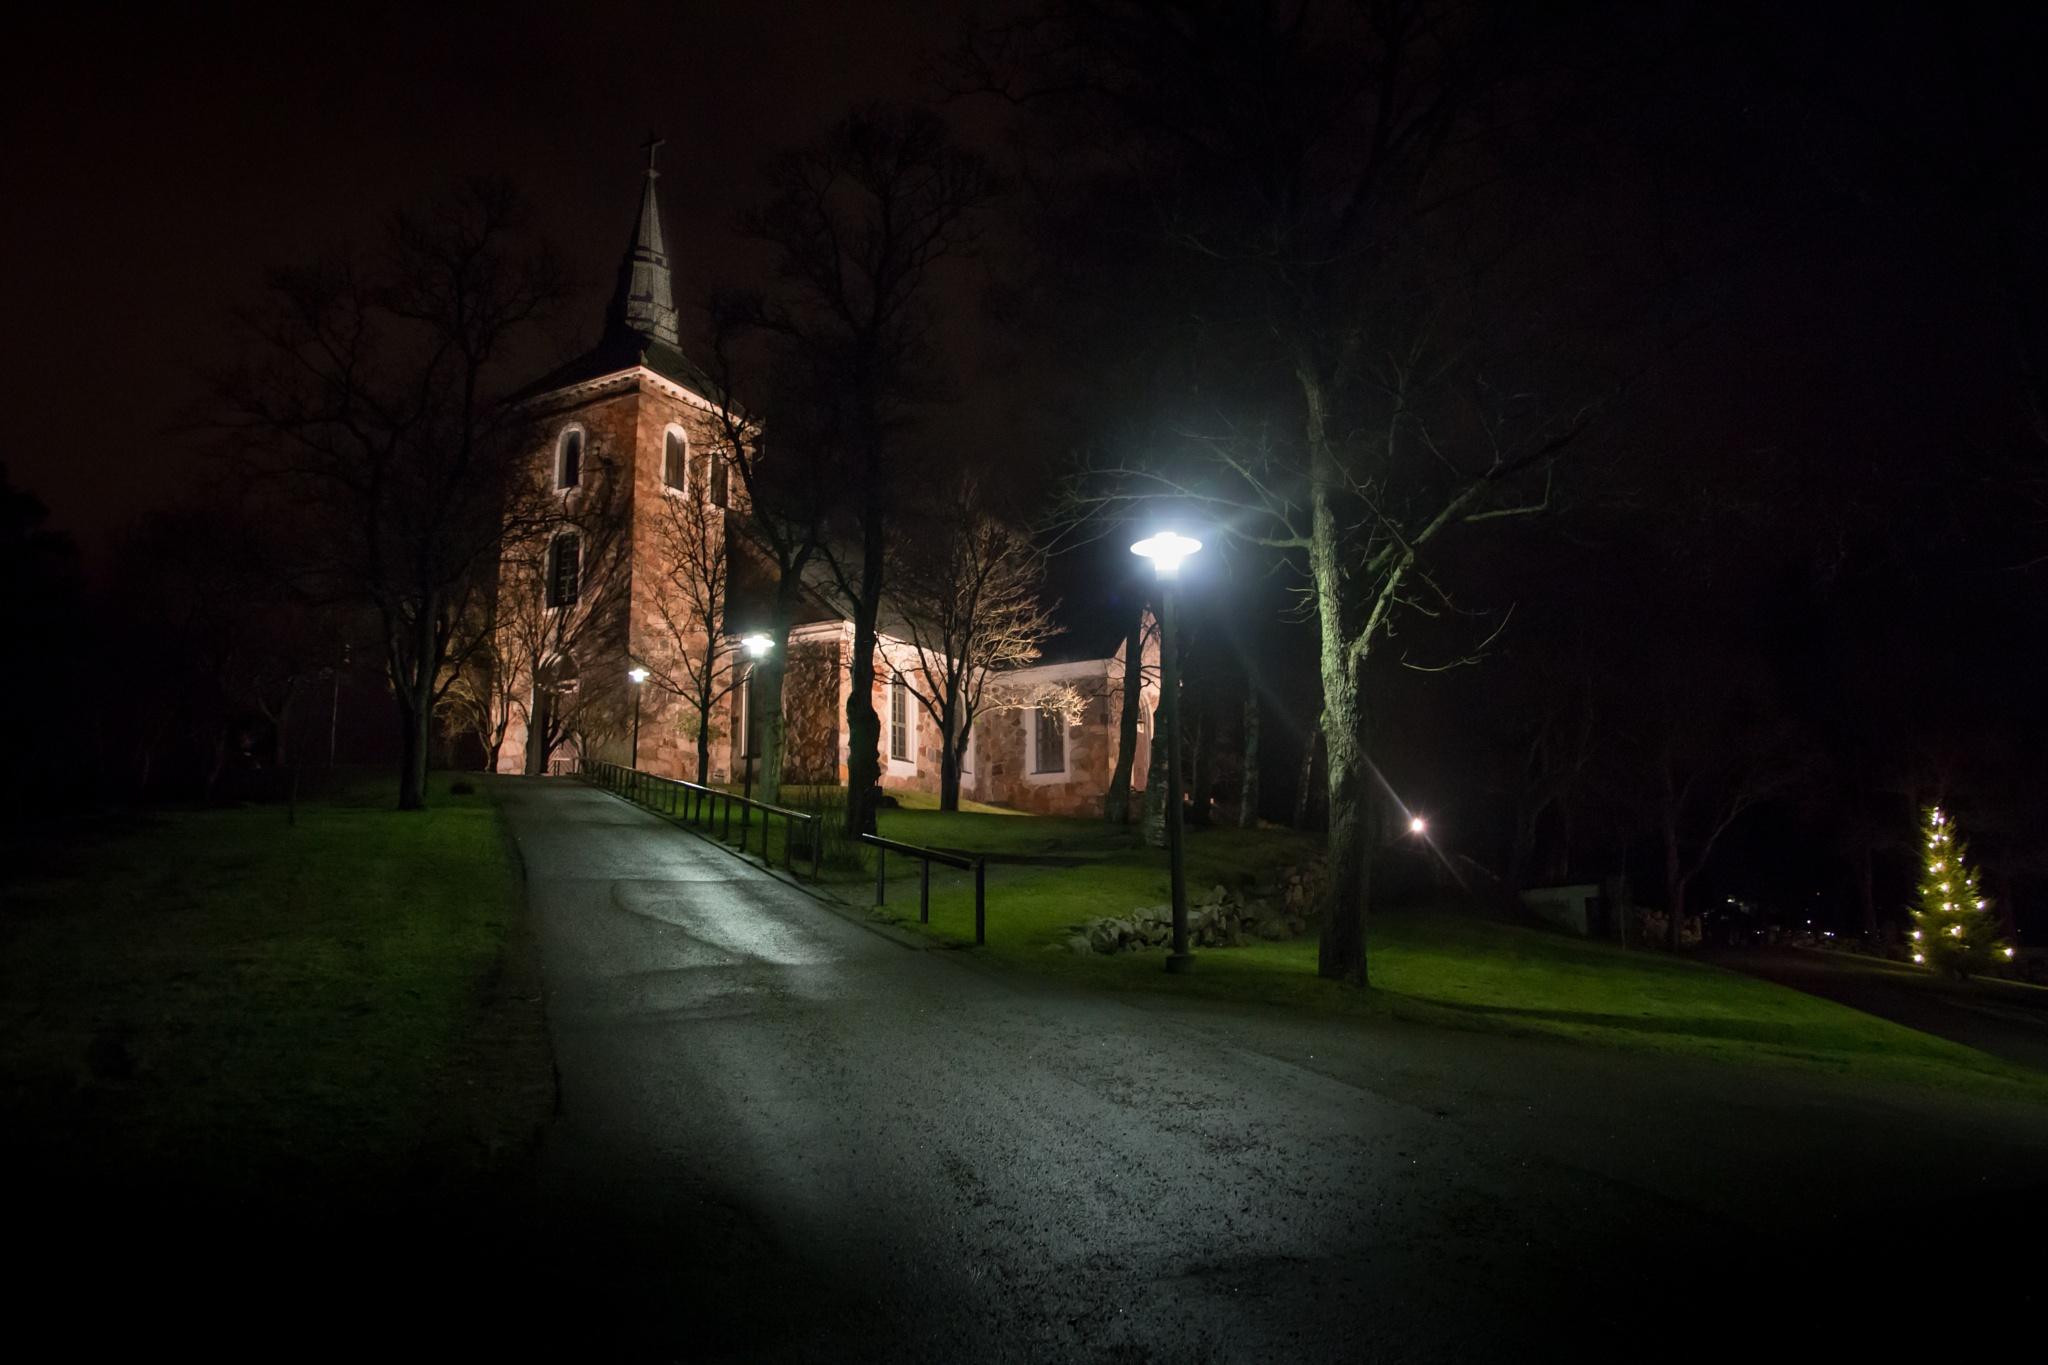 Salo-Uskela church by Karographix